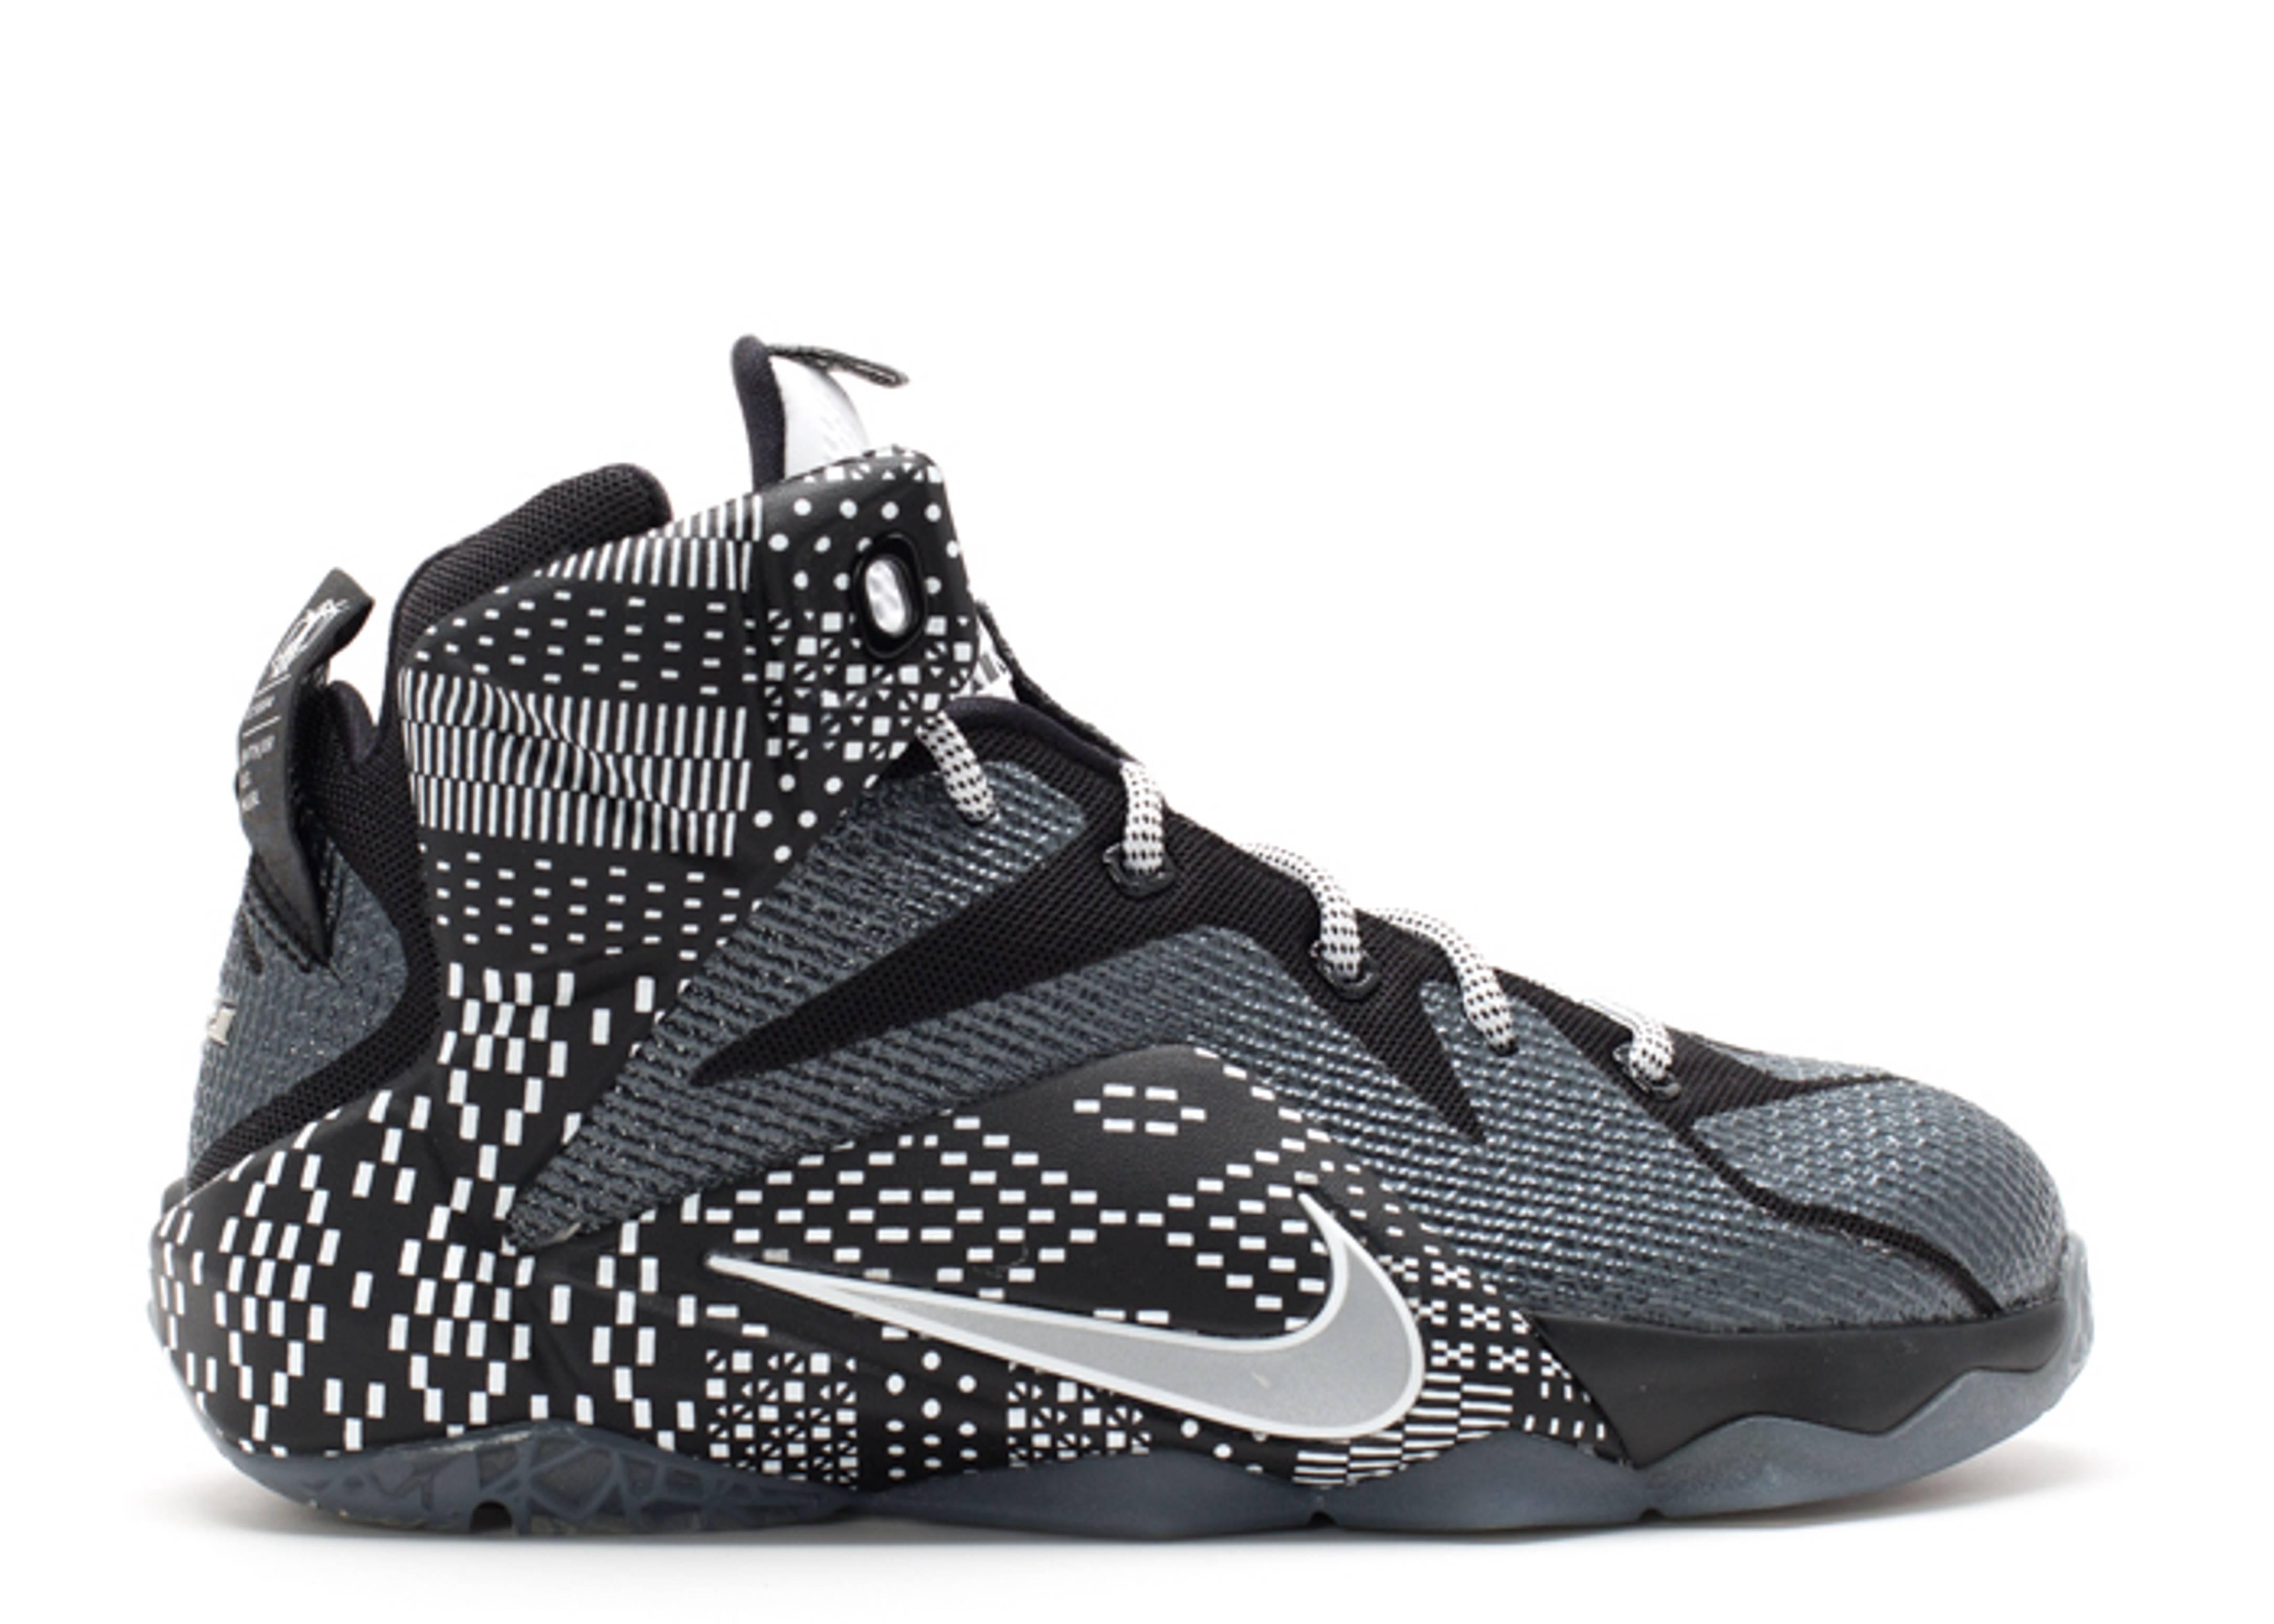 innovative design 2f04e c1f89 Lebron 12 Bhm (gs) - Nike - 726217 001 - black/white-metallic silver    Flight Club